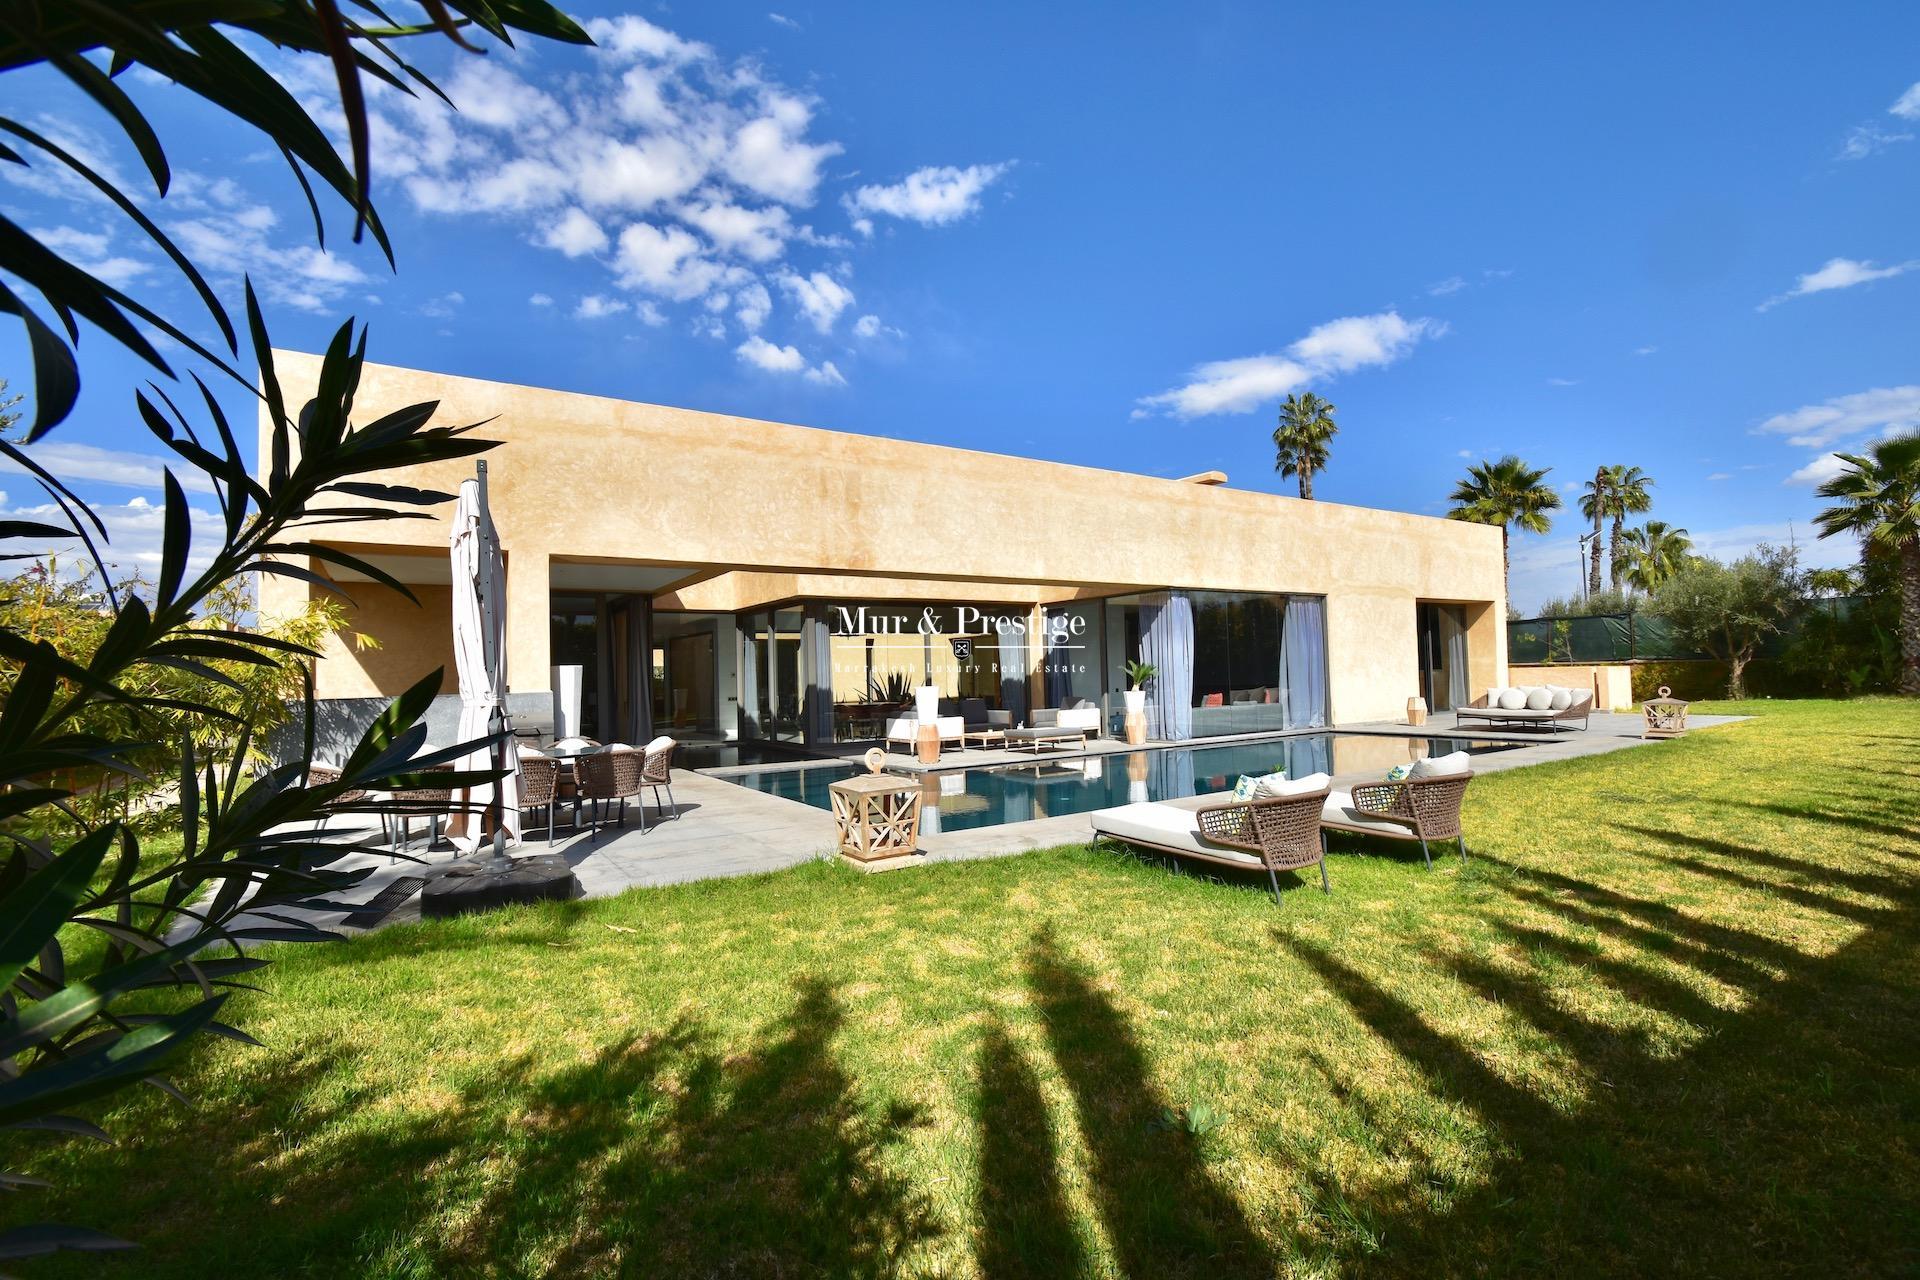 Villa de prestige en vente à Marrakech